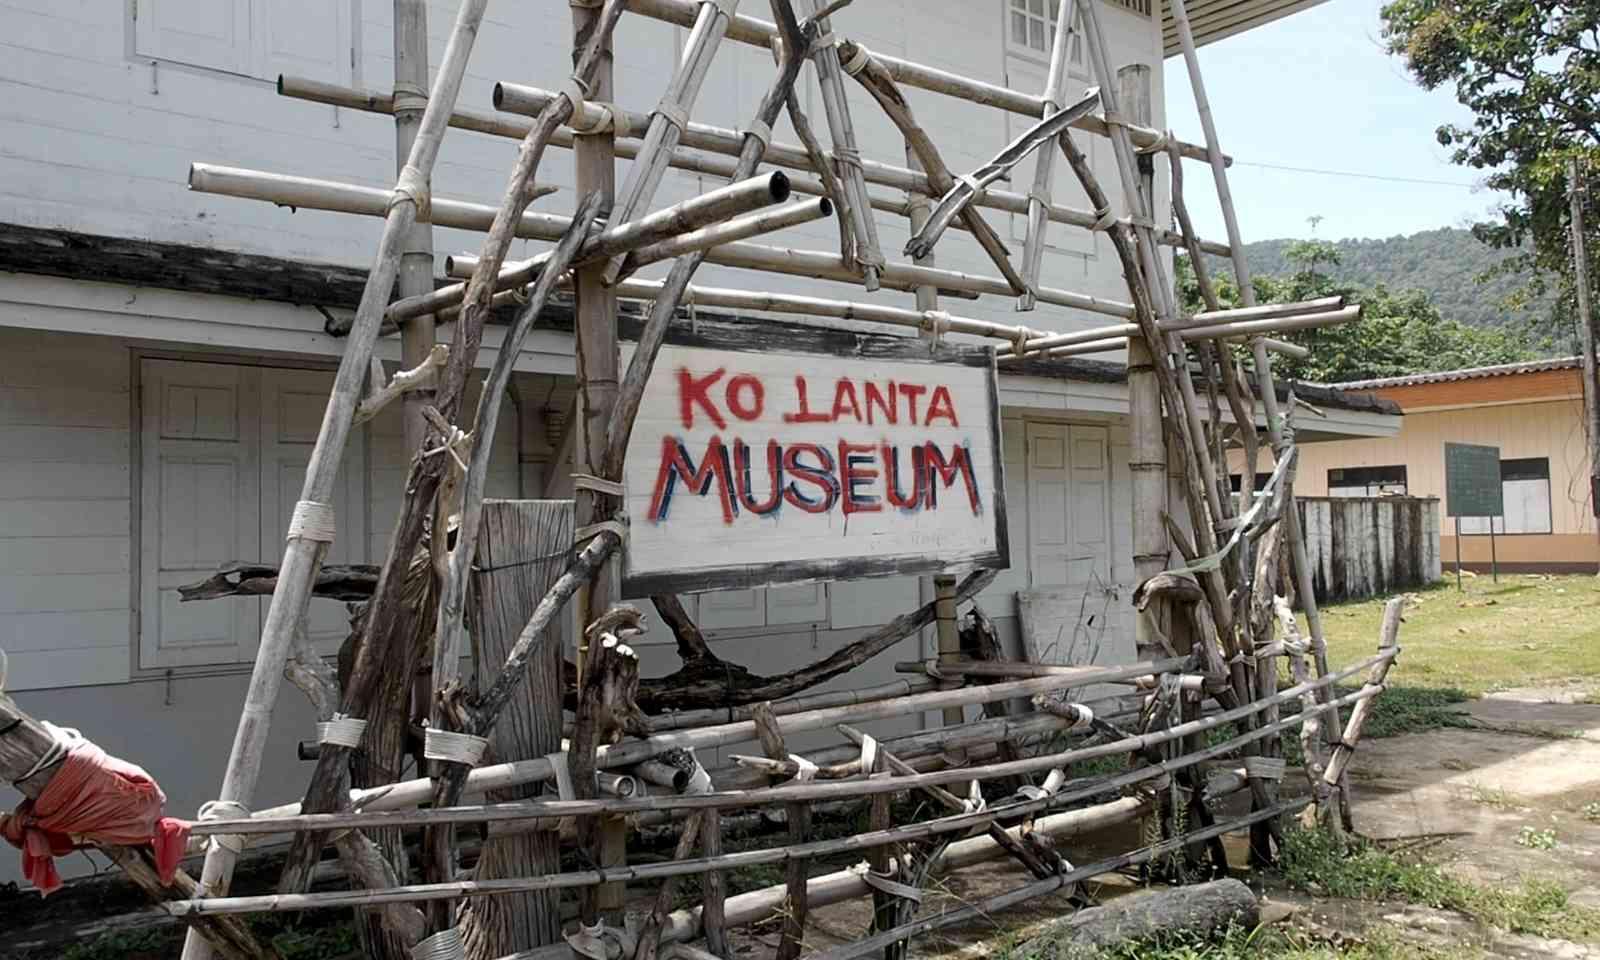 Ko Lanta museum. Never open. (Jamie Furlong)